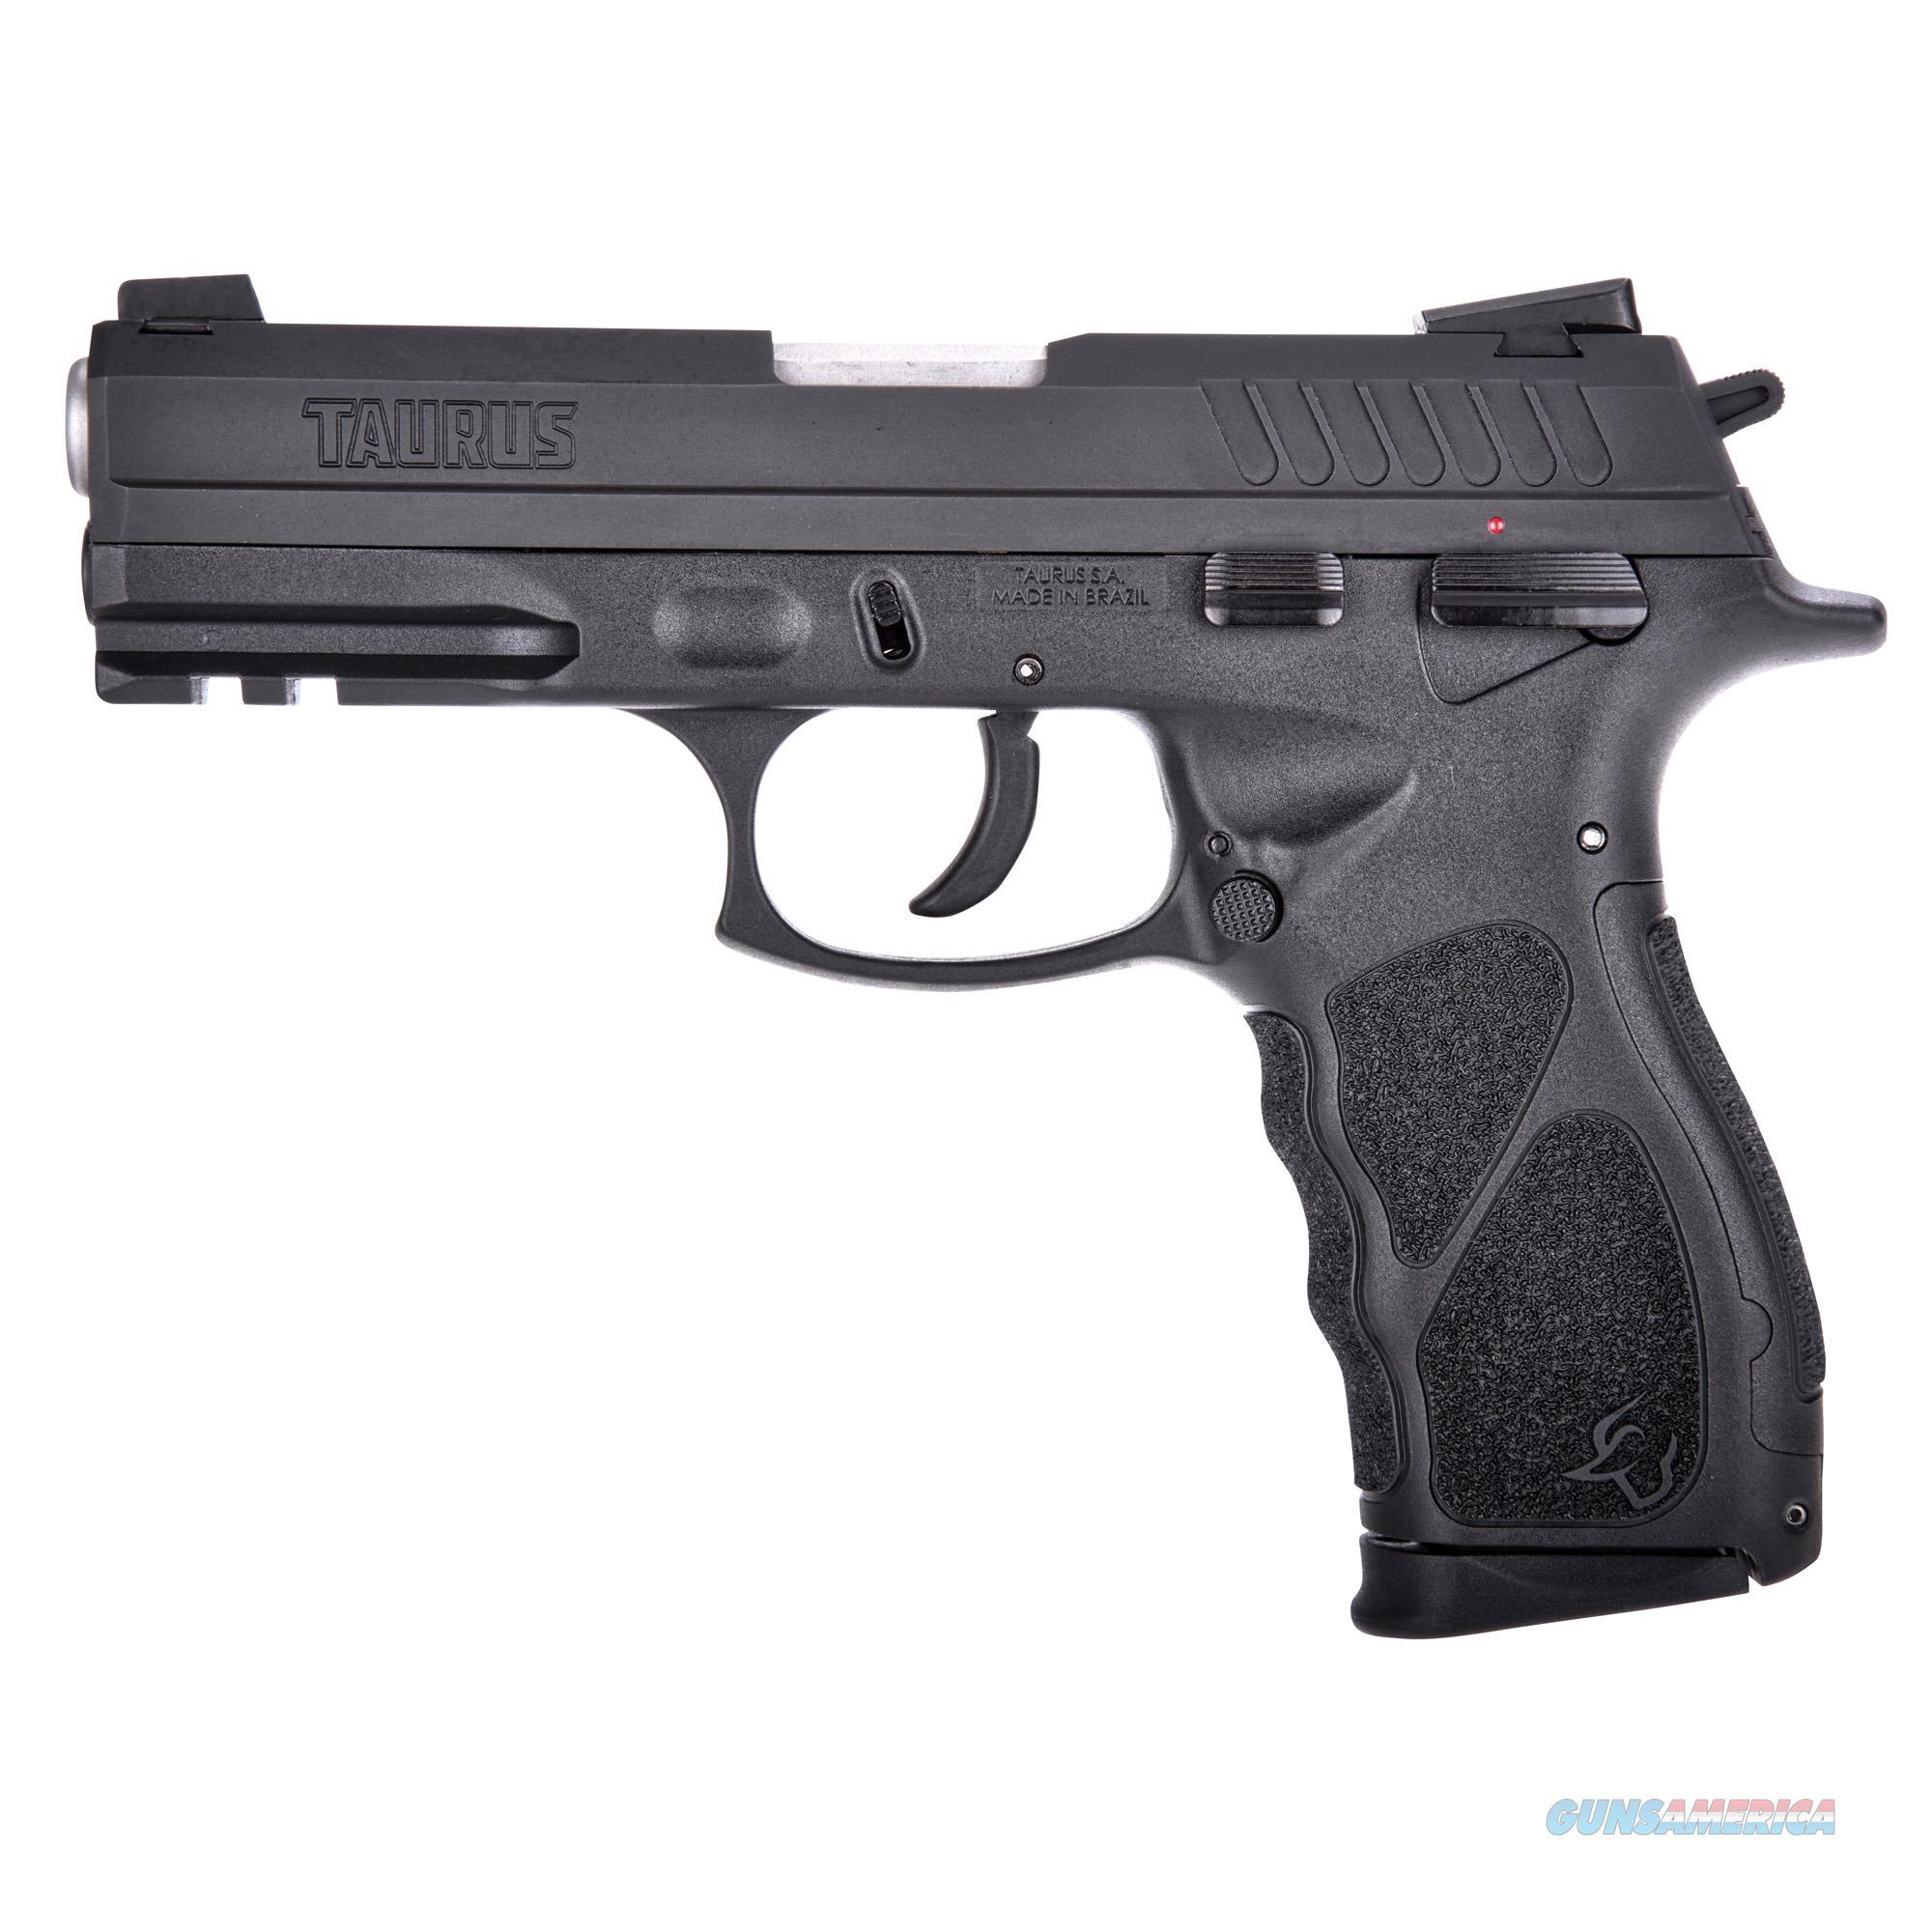 "Taurus TH9 9mm 4.25"" 17+1 - New in Box!  Guns > Pistols > Taurus Pistols > Semi Auto Pistols > Polymer Frame"